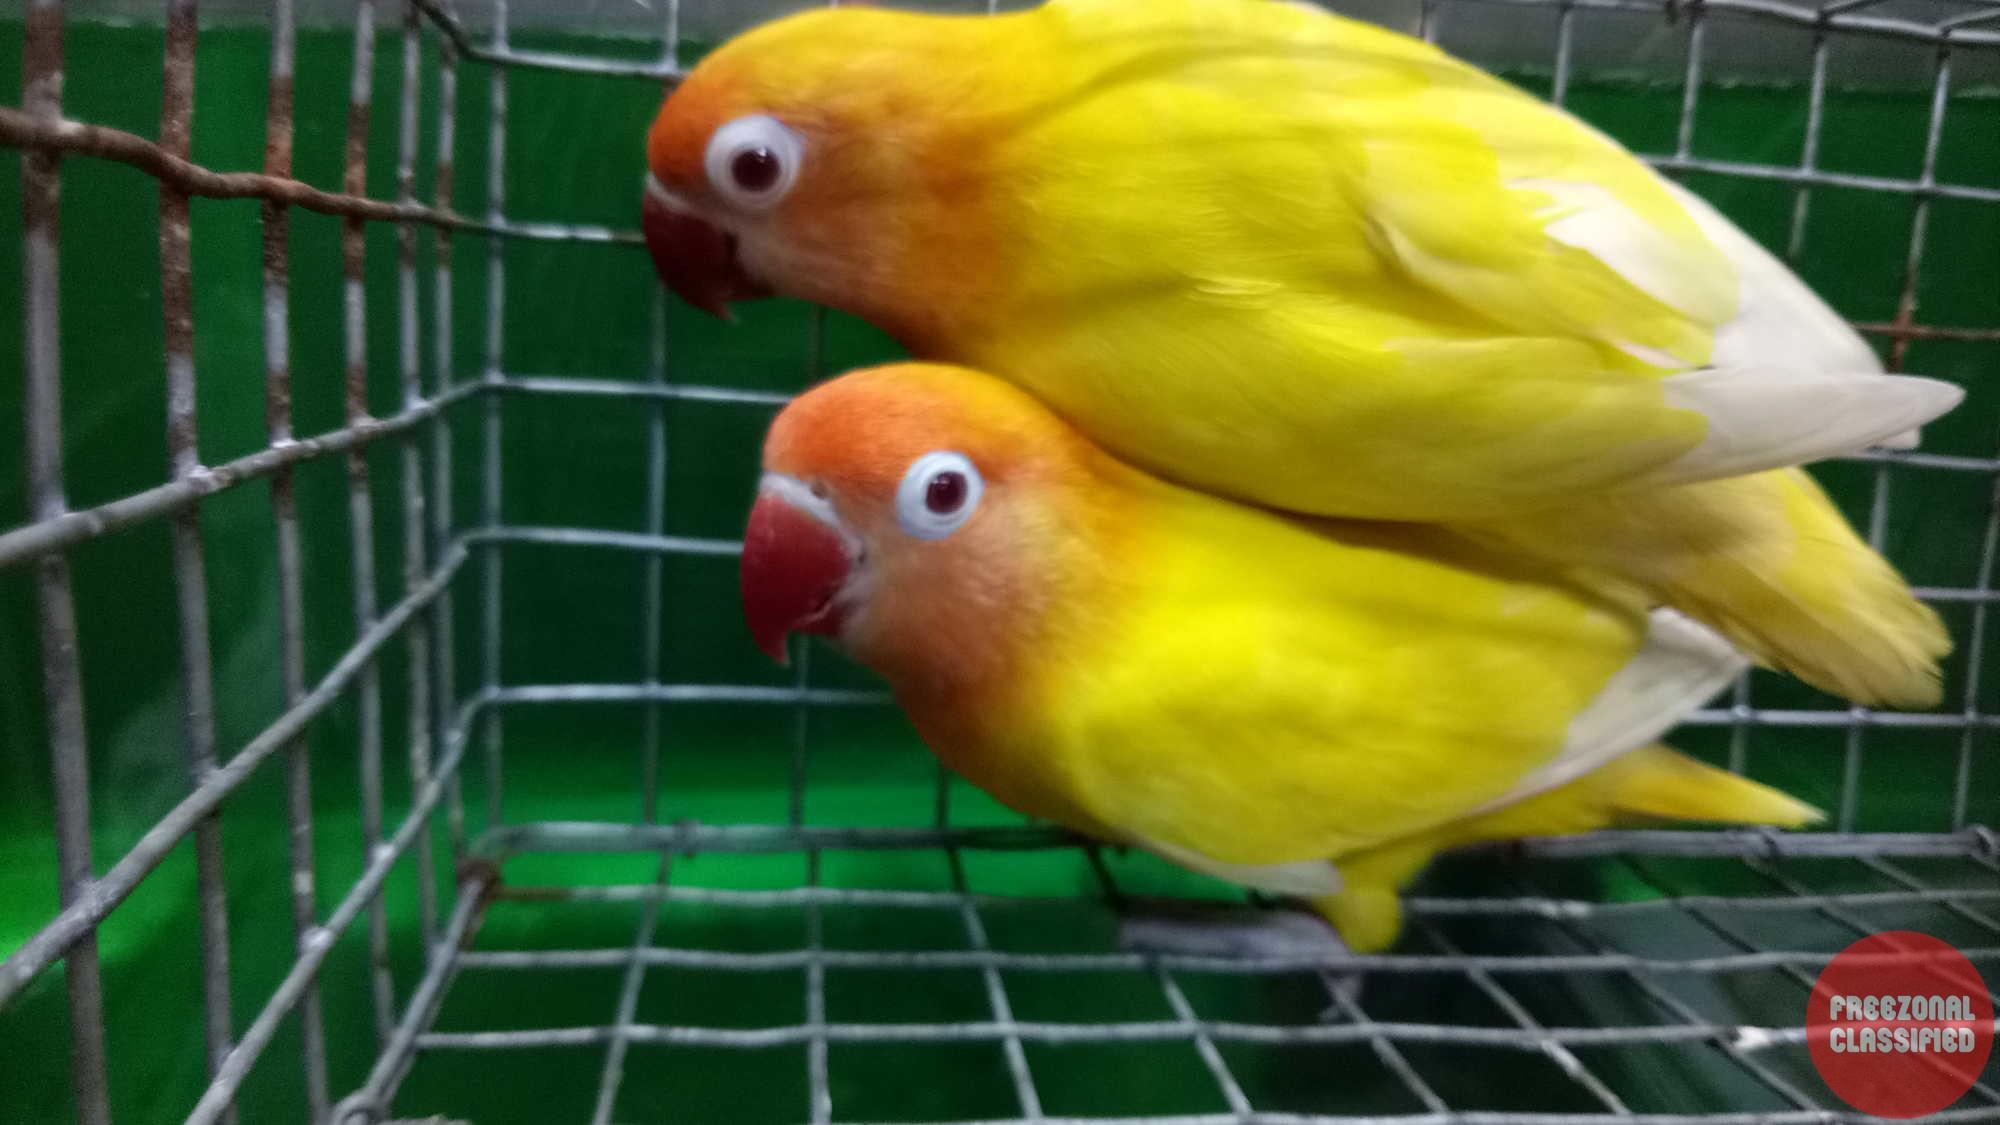 Bamboos Pets Exotics Pet Shop In Chalai Thiruvananthapuram Kerala Reviews Offers Contact Numbers Details Rating